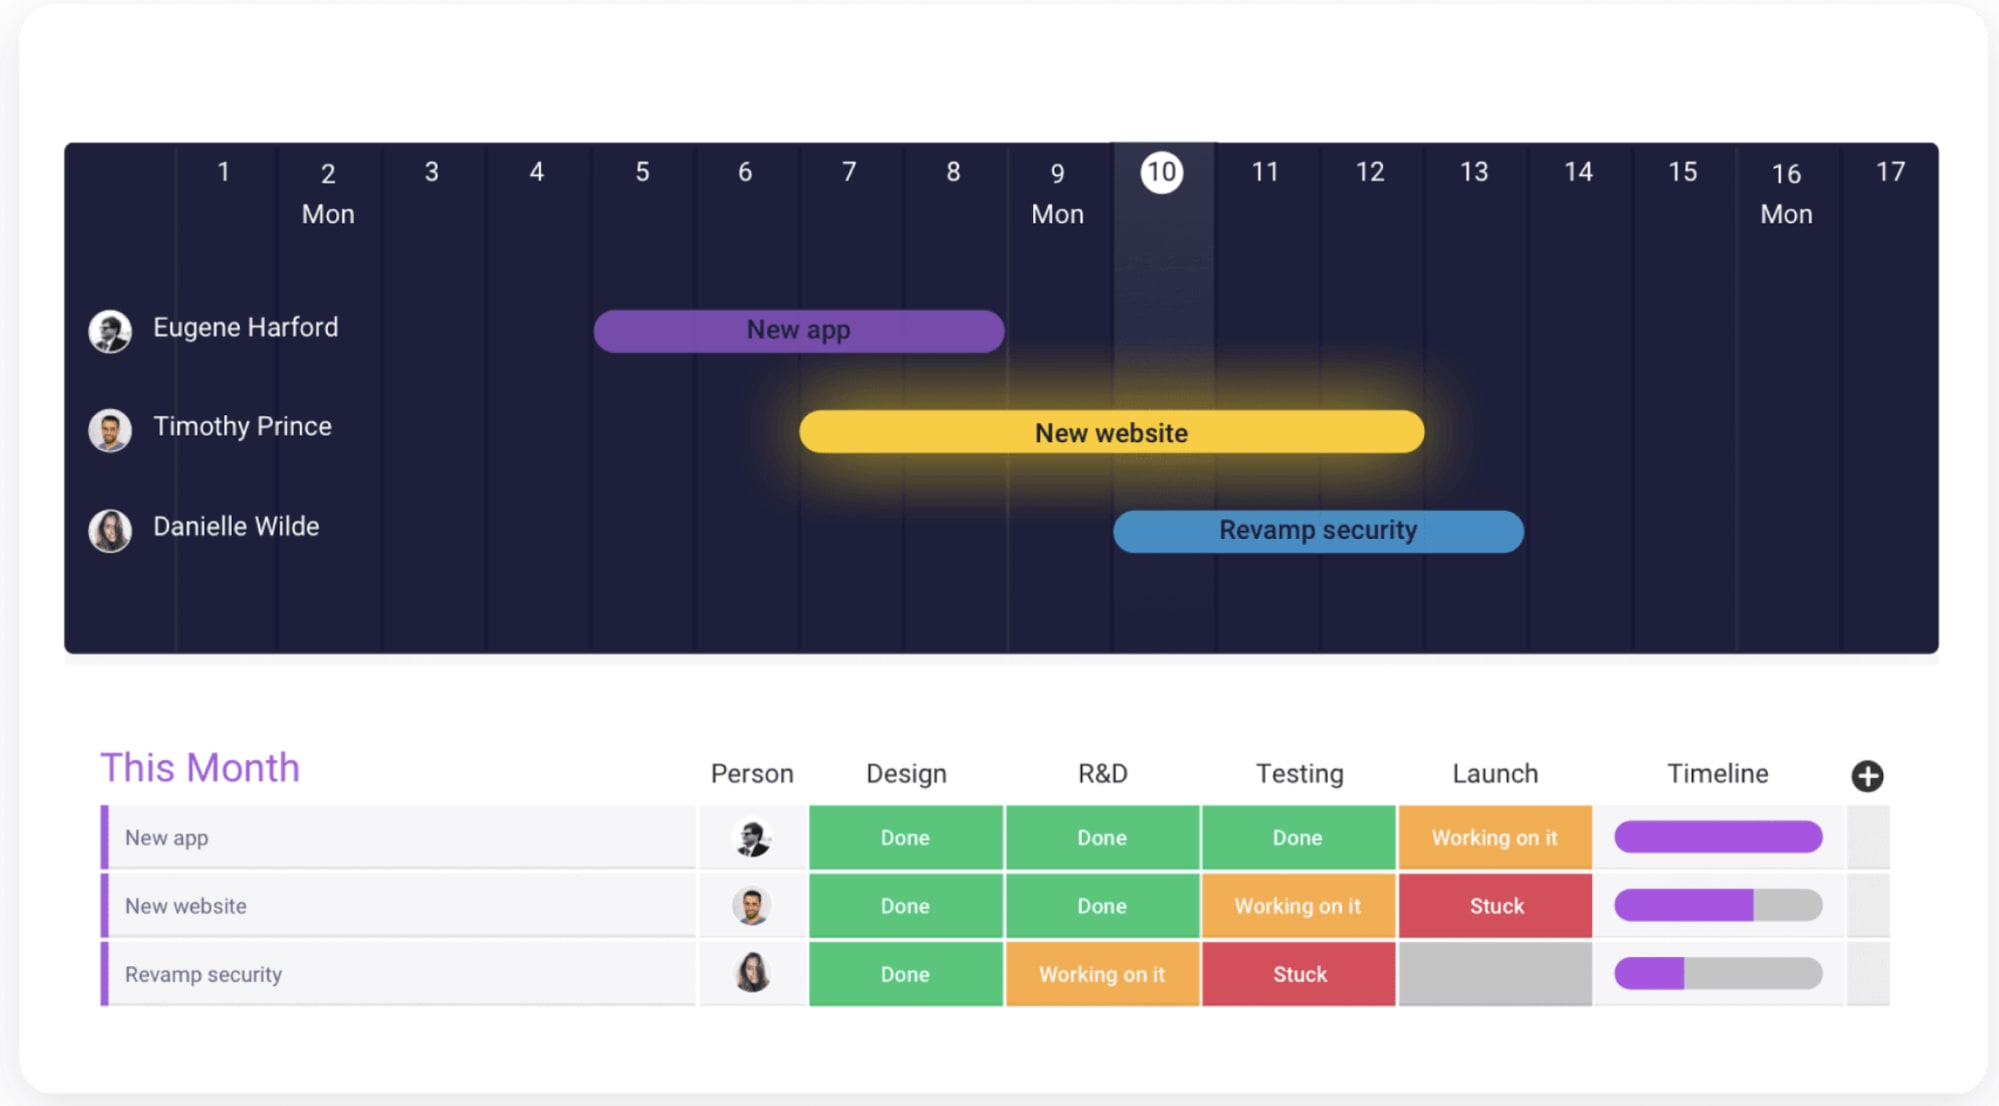 Screenshot of monday.com prokect management calendar